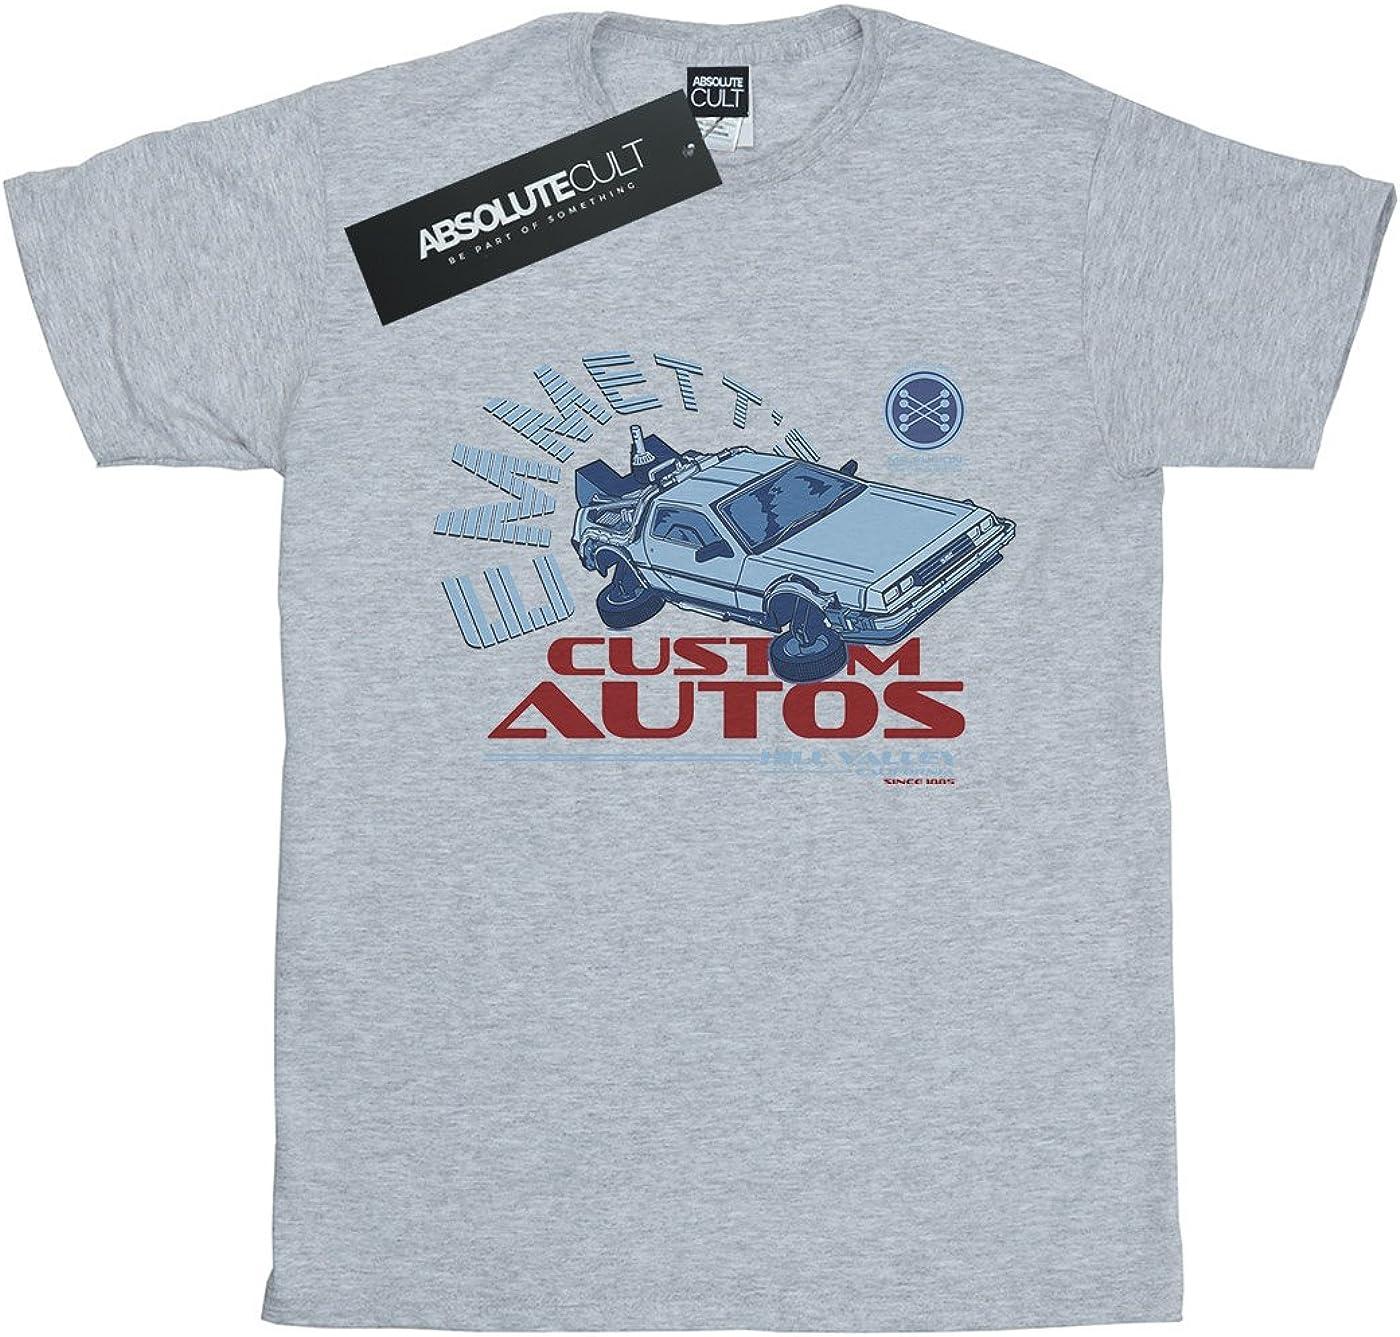 Alex Chenery Boys Emmetts Customs T-Shirt